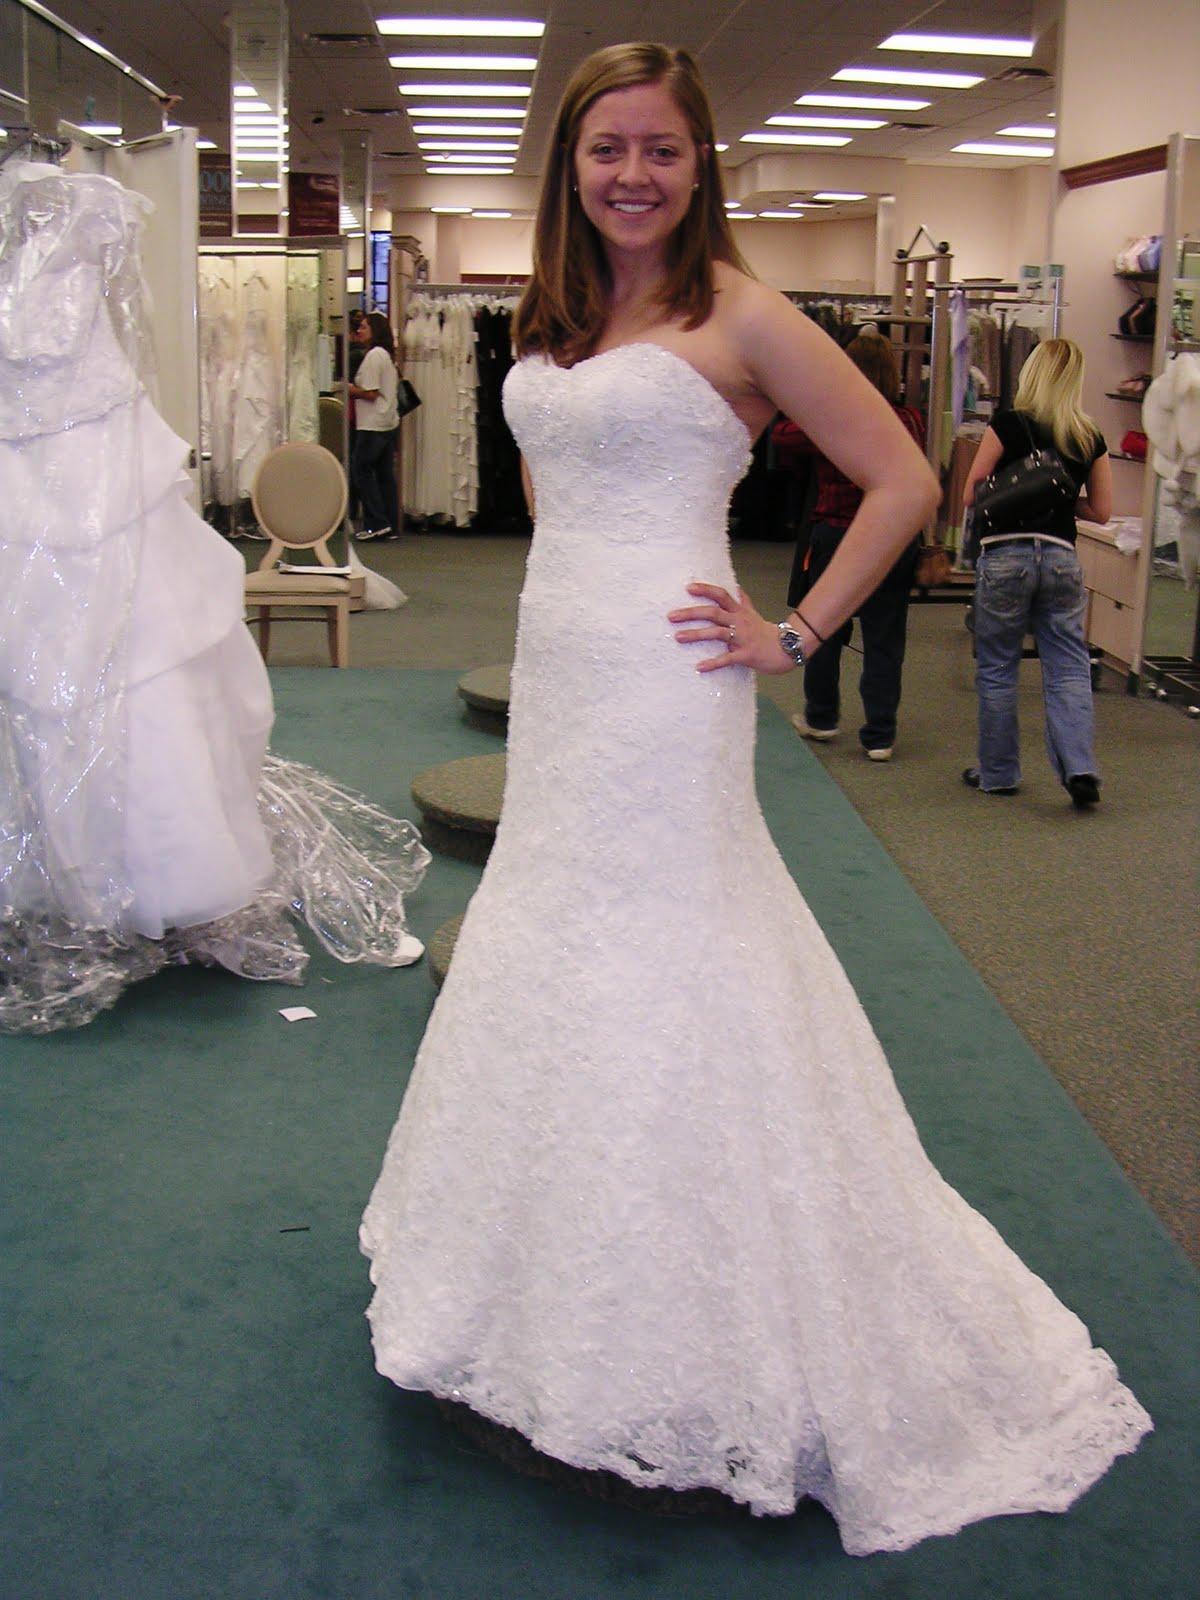 fdcc41b2f2b Wedding Planning Tips - Fiscally Chic